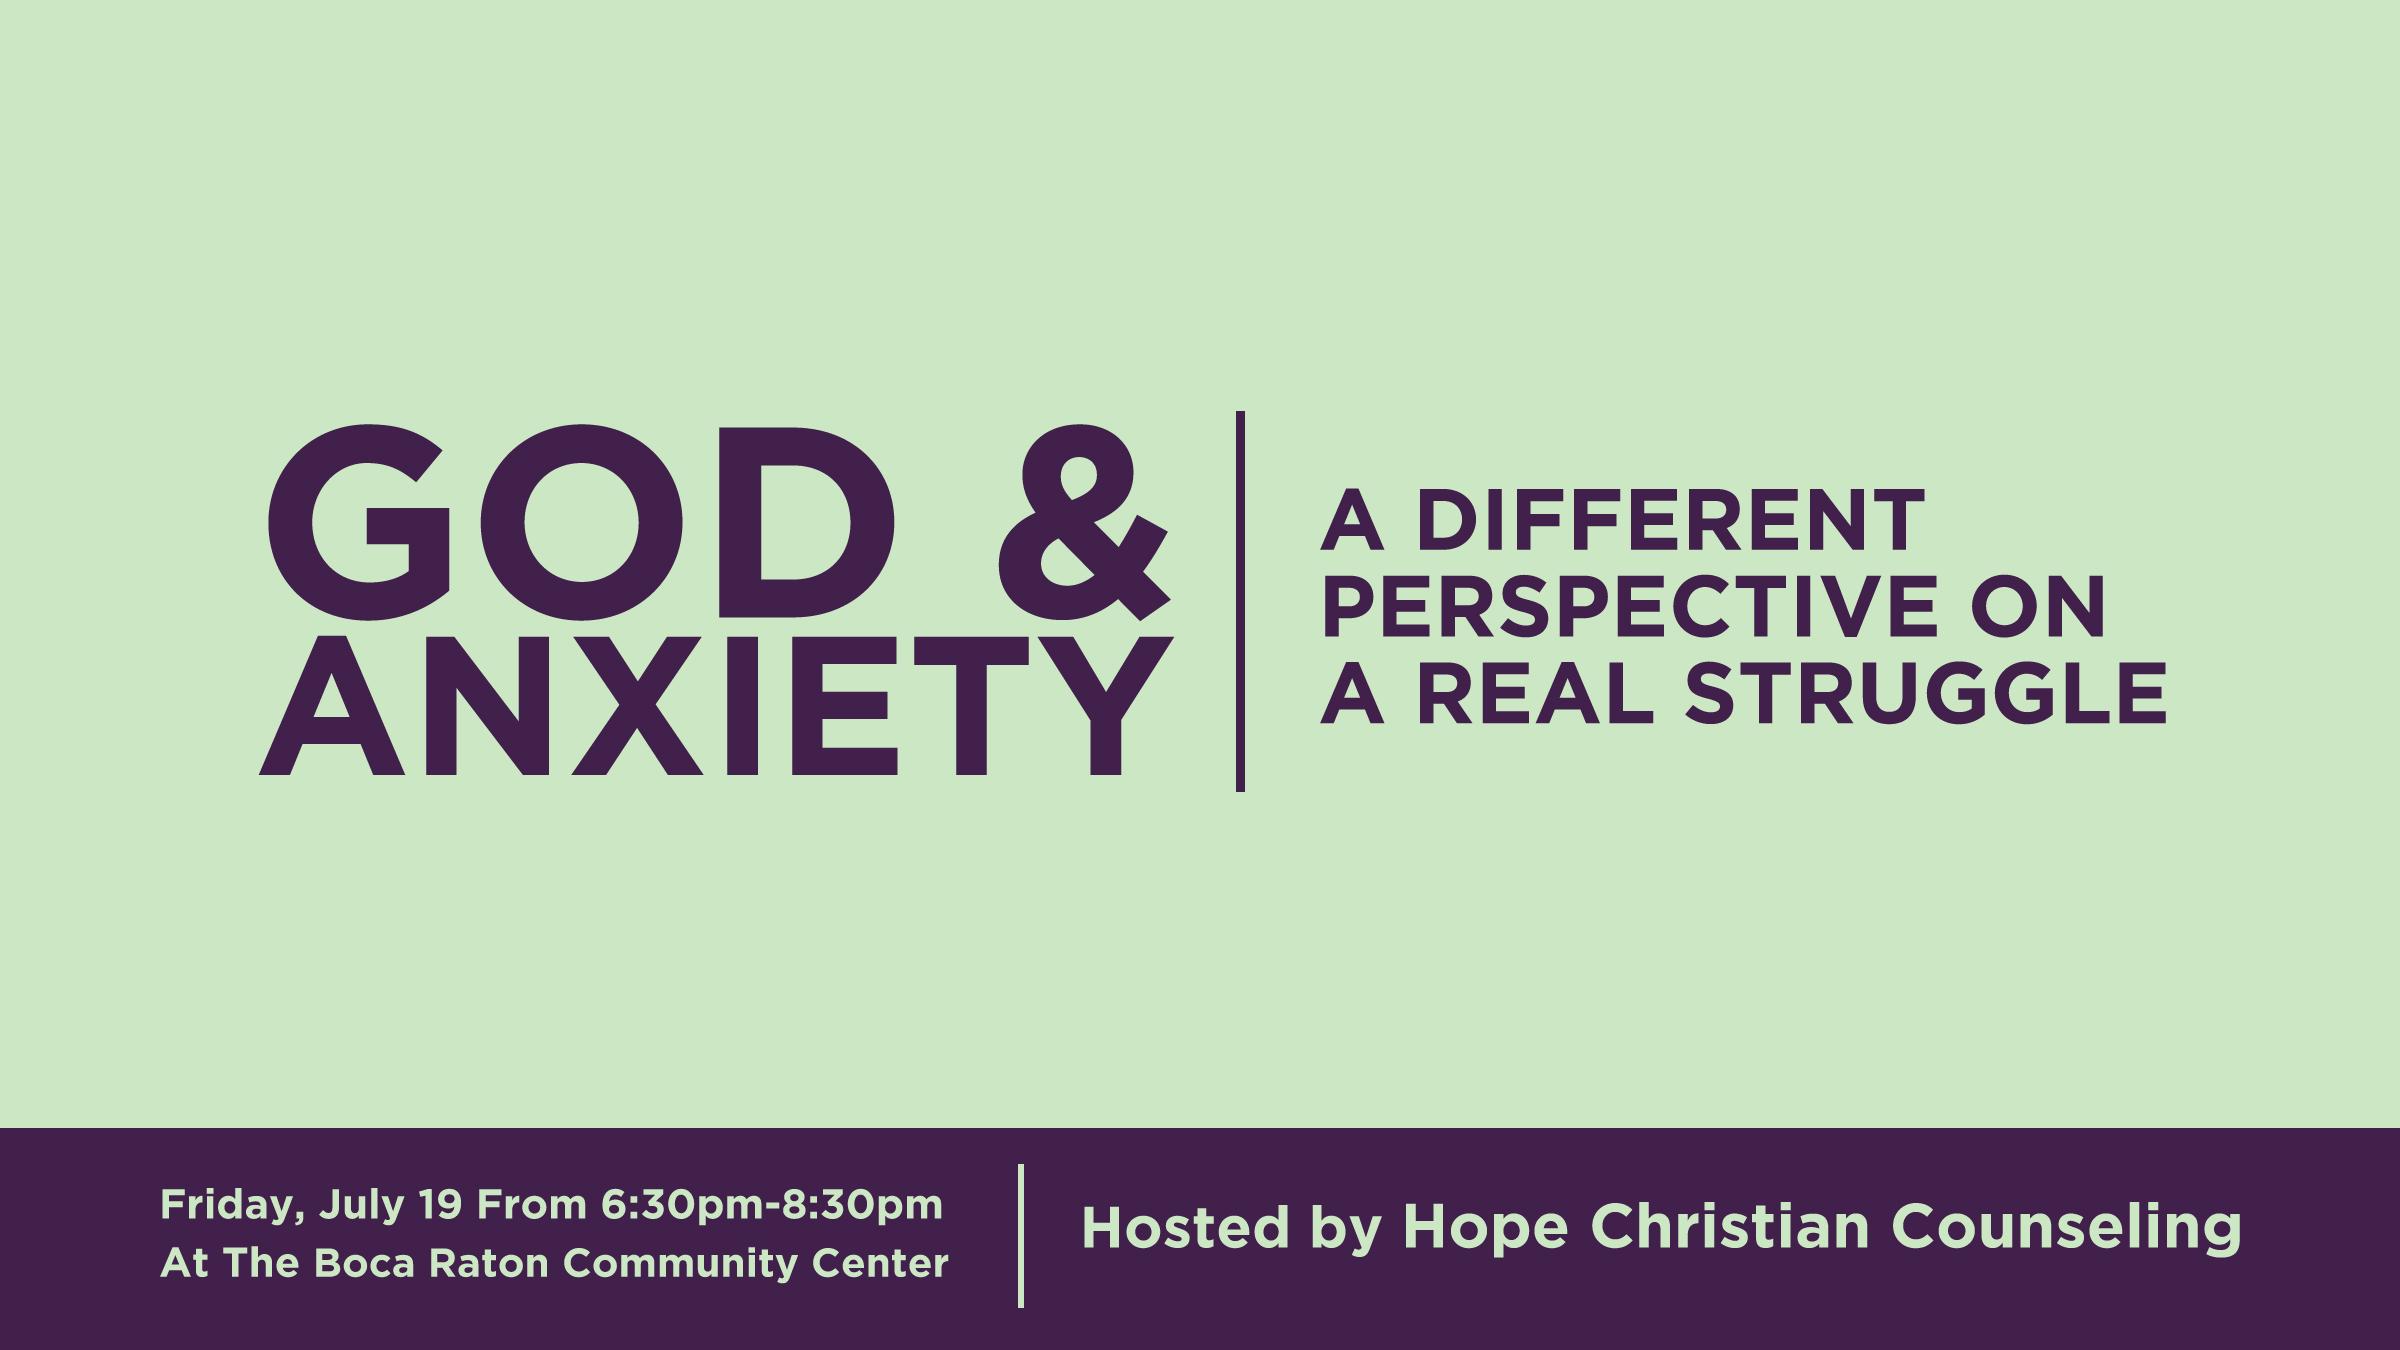 God & Anxiety HD slide - Social Media.jpg